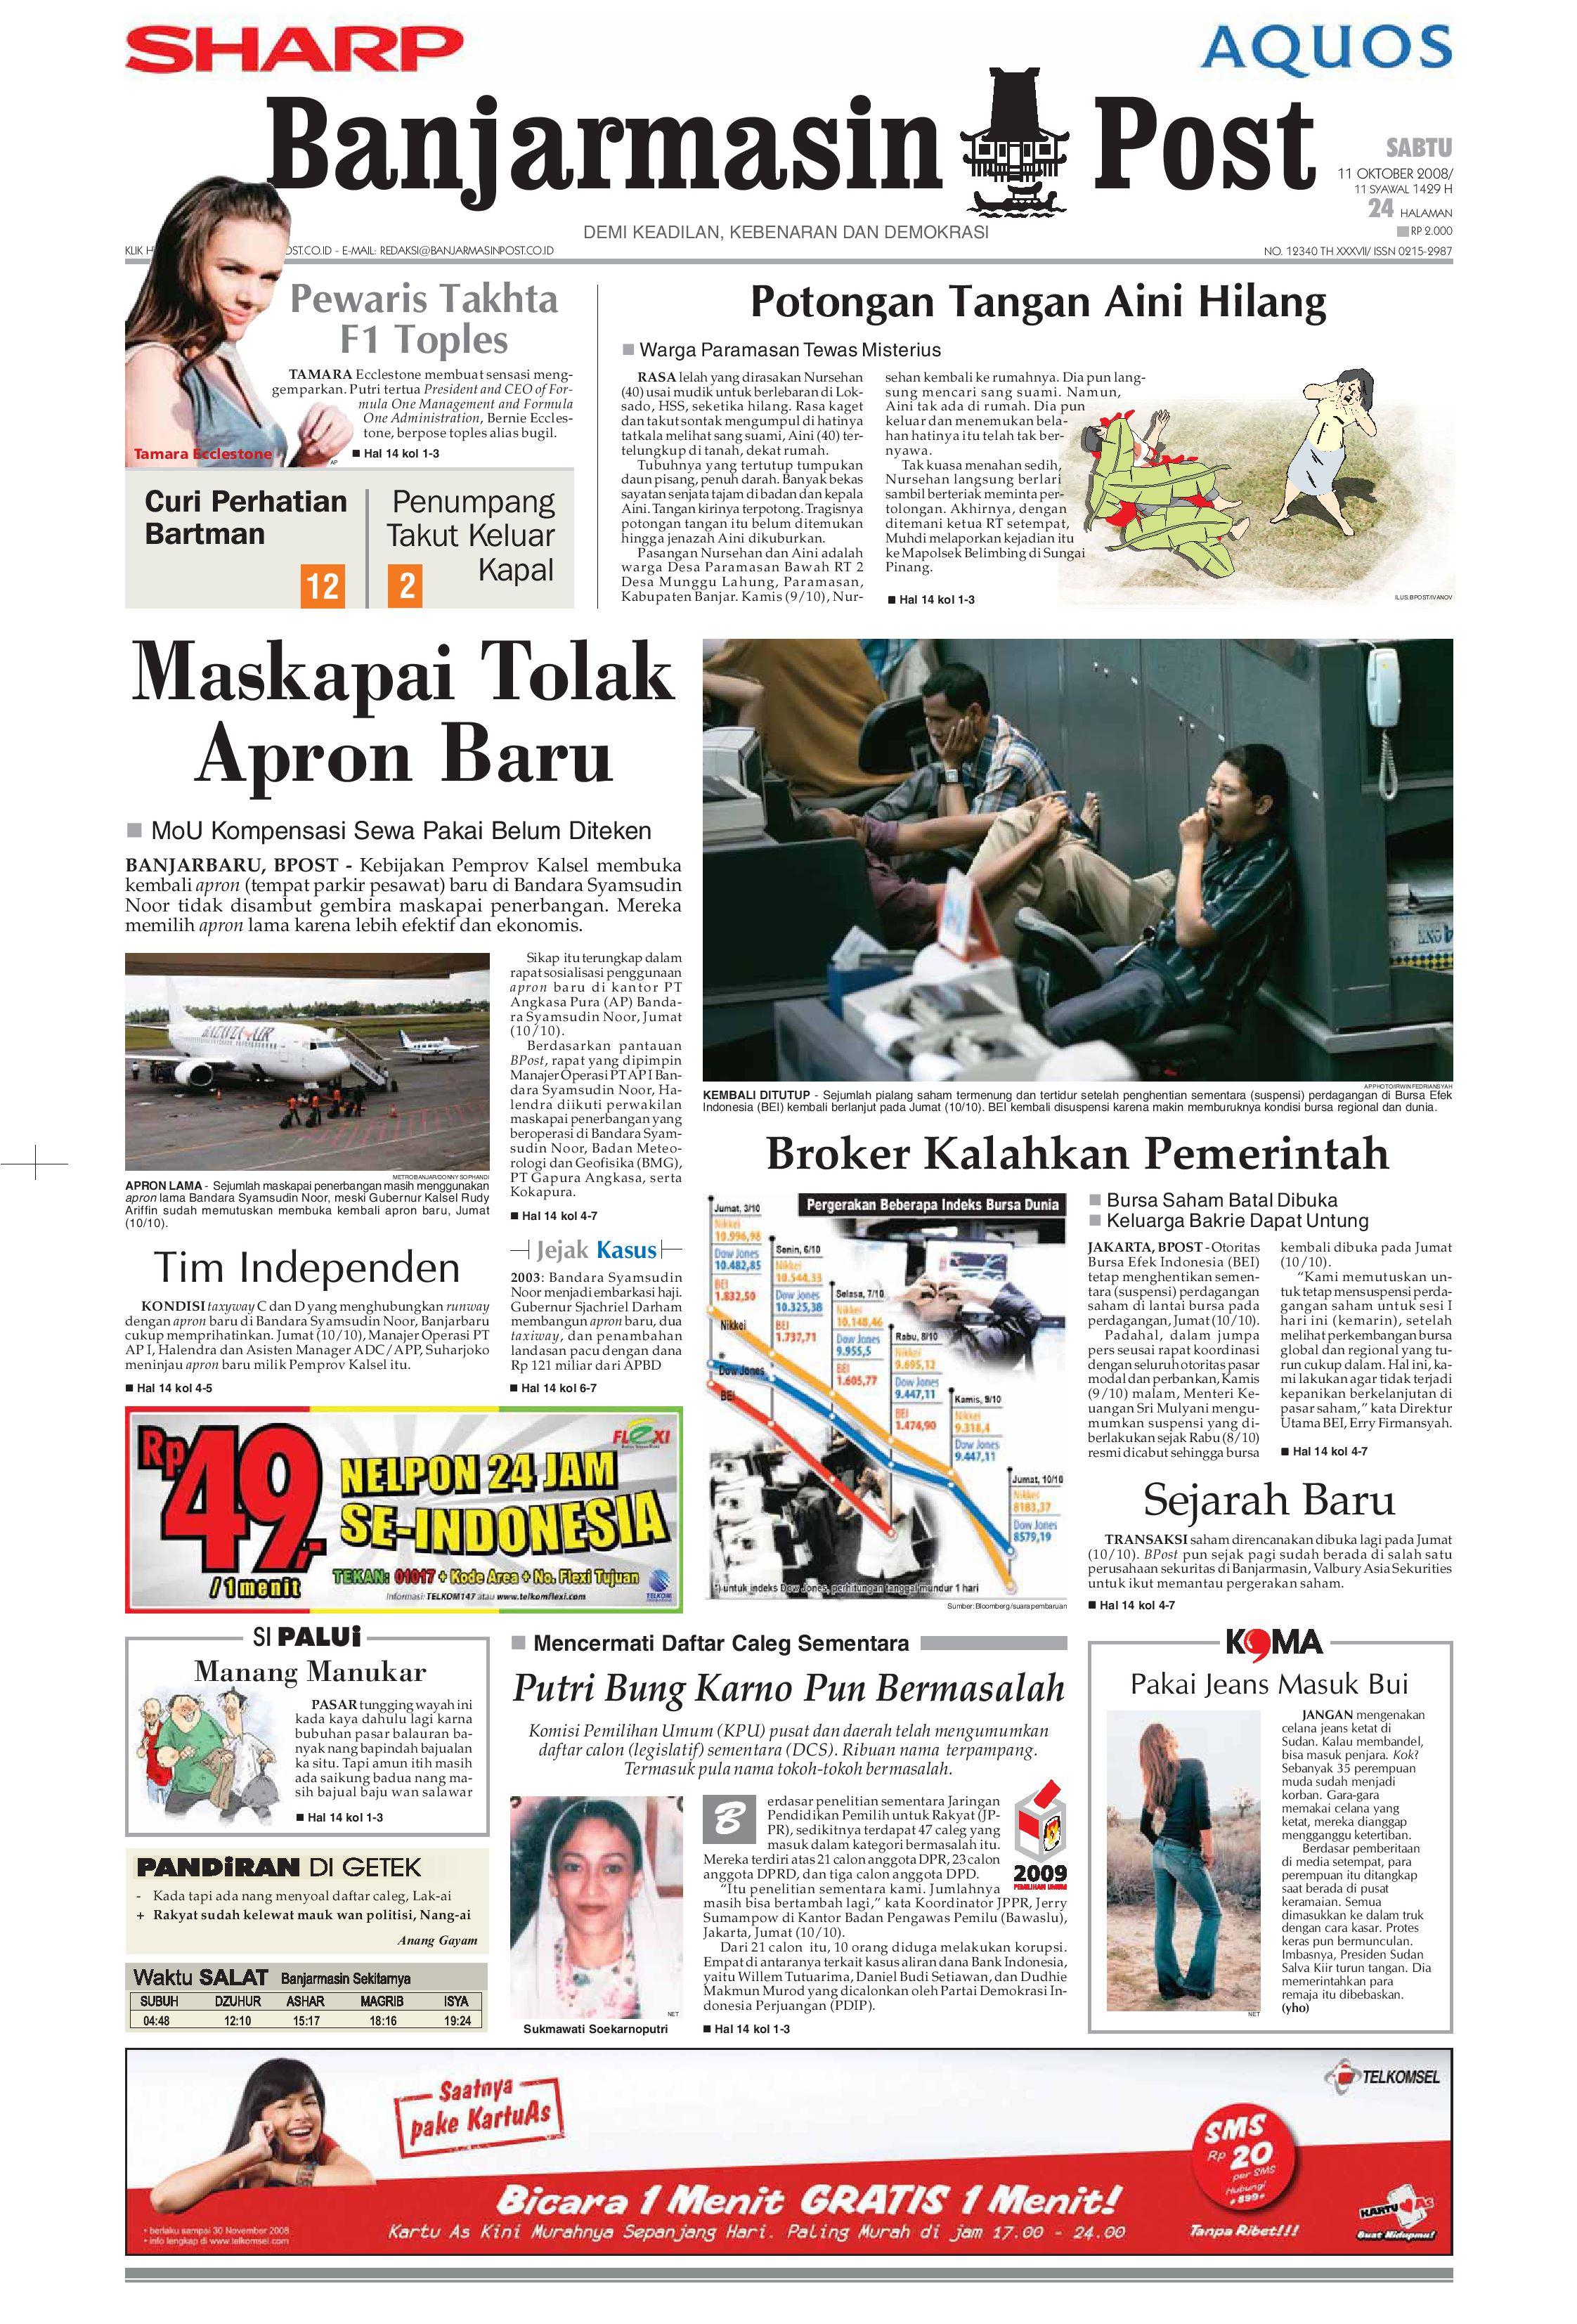 Jual Murah Giwang Emas Khas Bali By Salon Mega Update 2018 Tcash Vaganza 17 Botol Minum Olahraga Aluminium 750ml Biru Banjarmasin Post Sabtu 11 Oktober 2008 Issuu